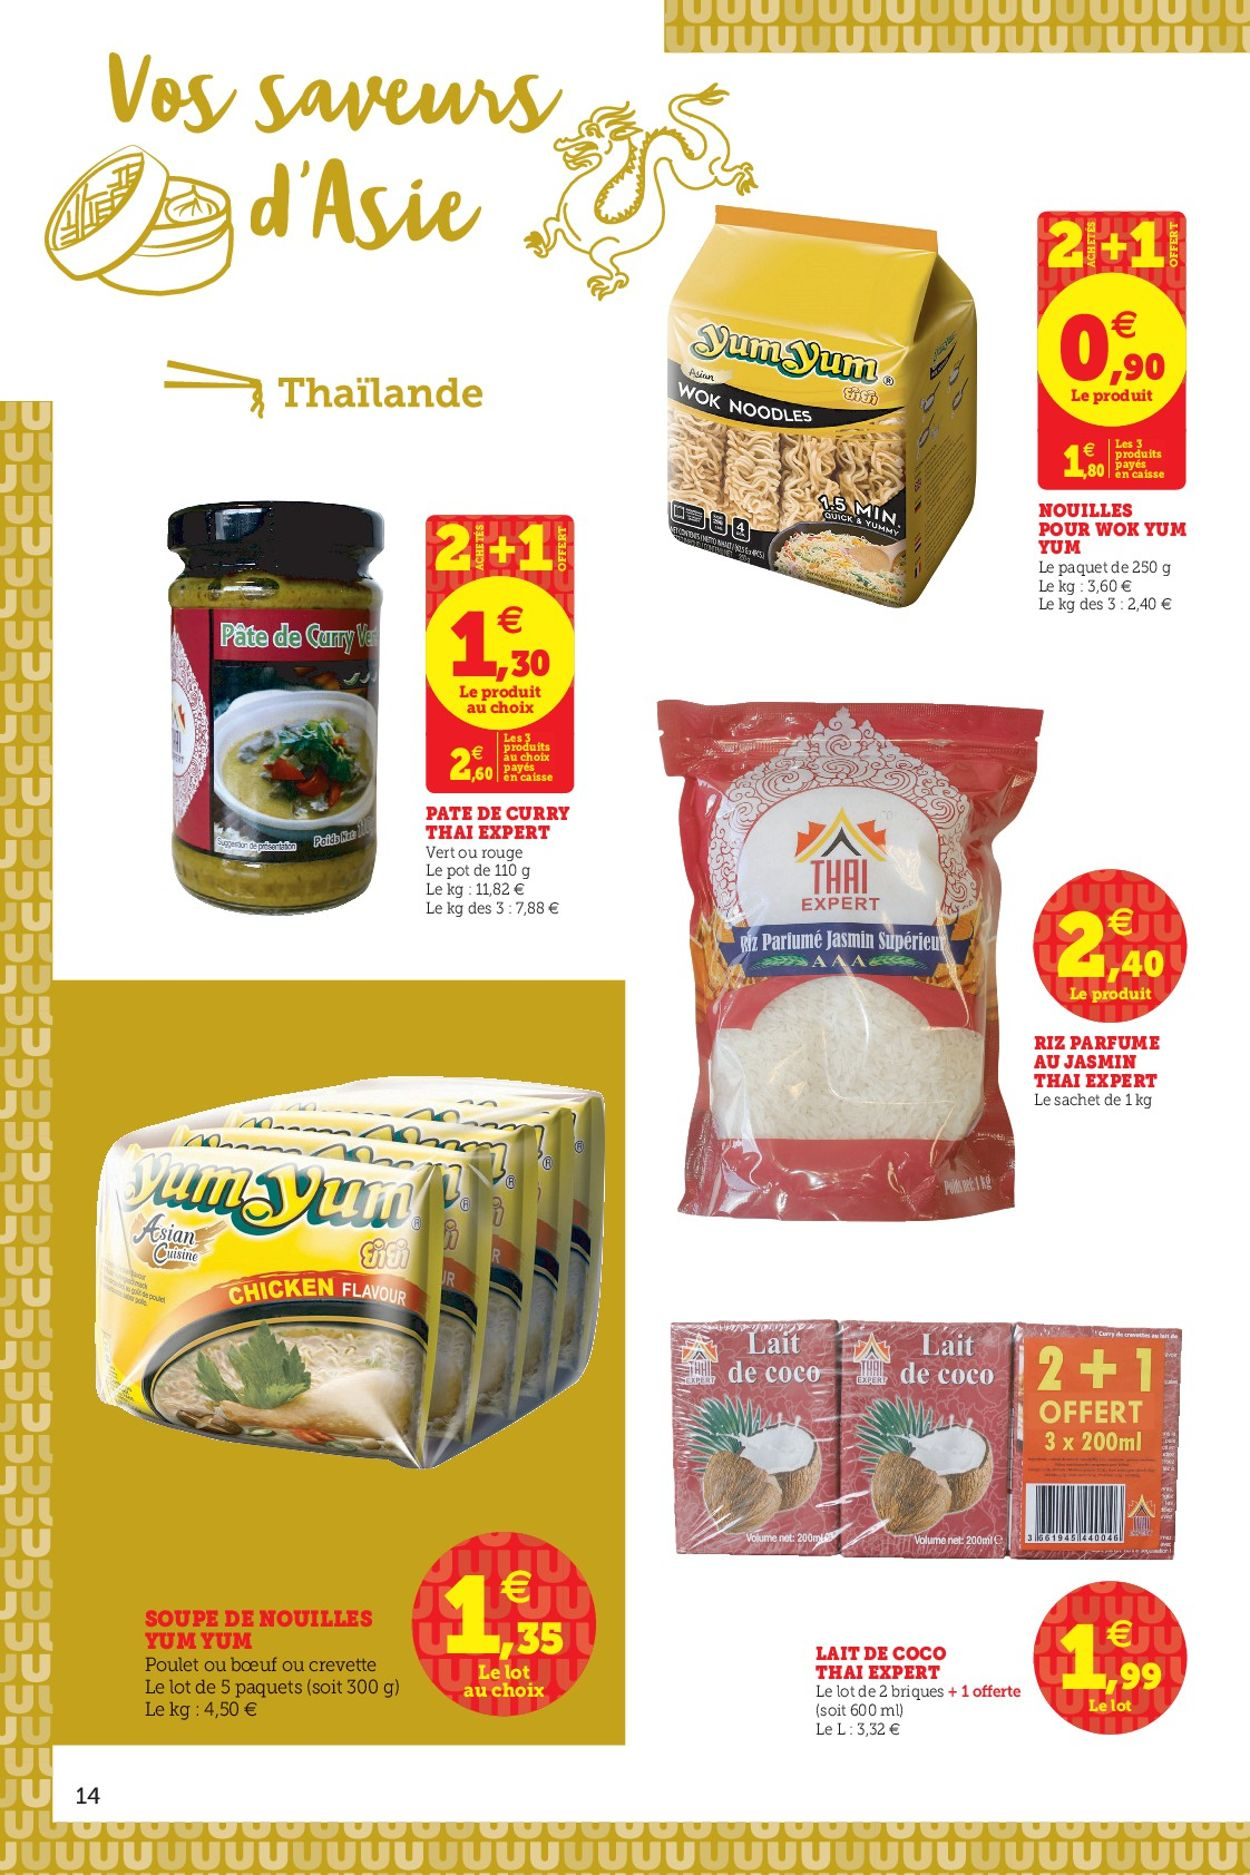 Magasins U Prix Gourmand 2021 Catalogue - 26.01-06.02.2021 (Page 14)